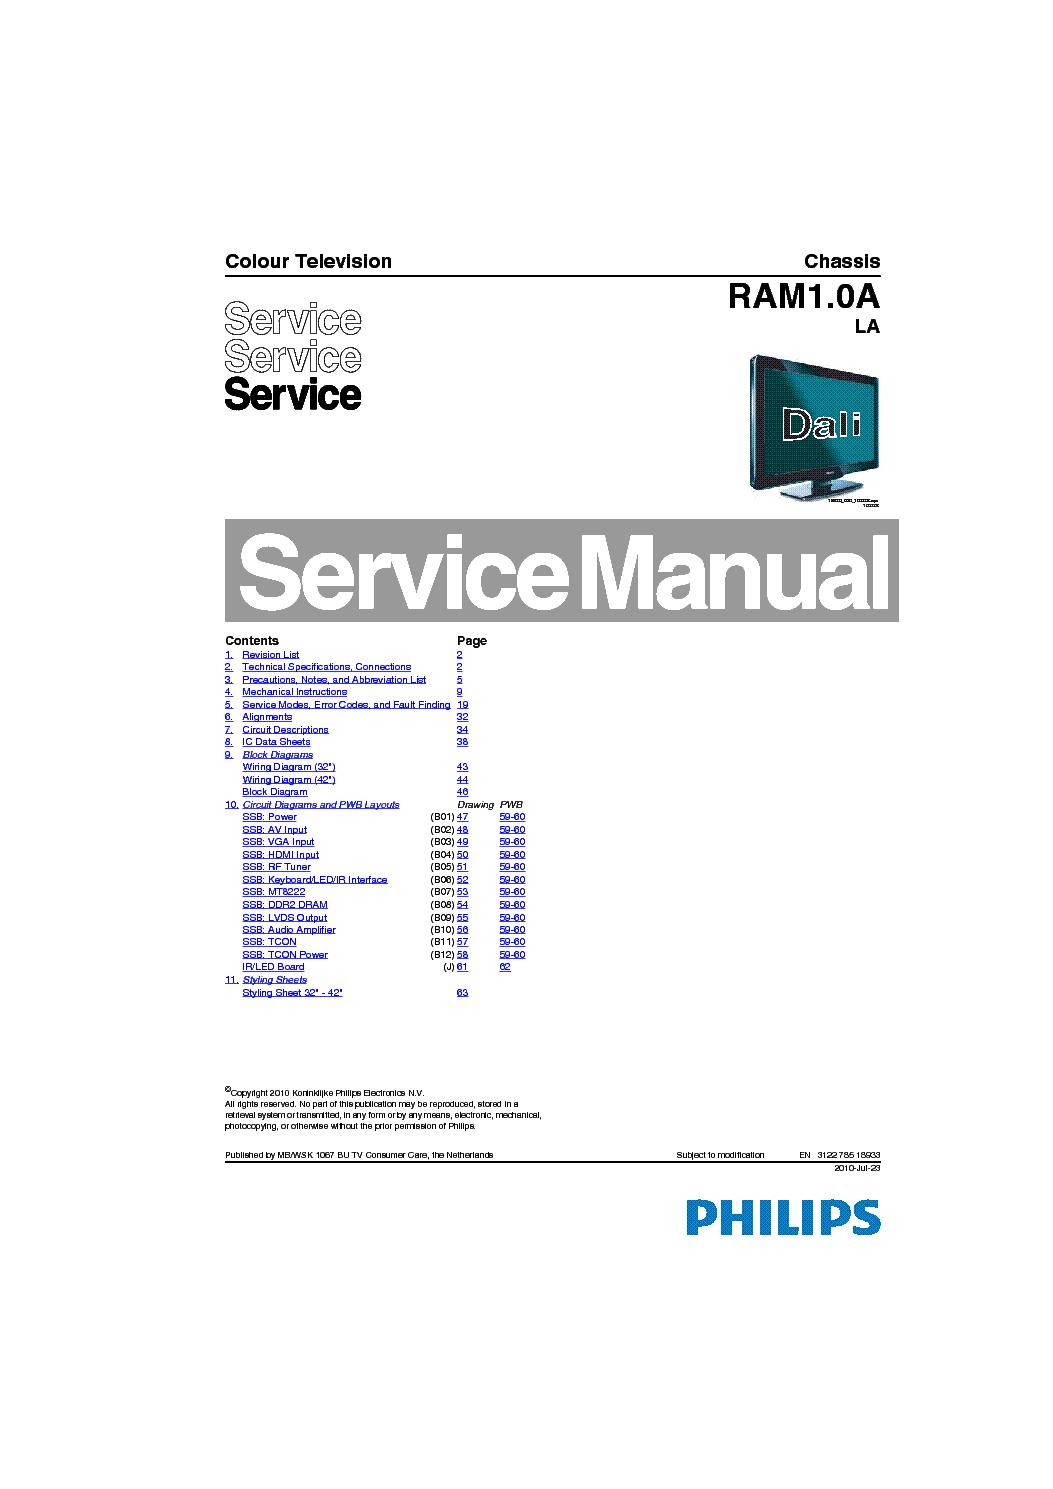 philips 42pfl3605s 98 chassis ram1 0a la dali service manual rh elektrotanya com Philips Universal Remote SRP2003 27 Manual Philips Product Manuals